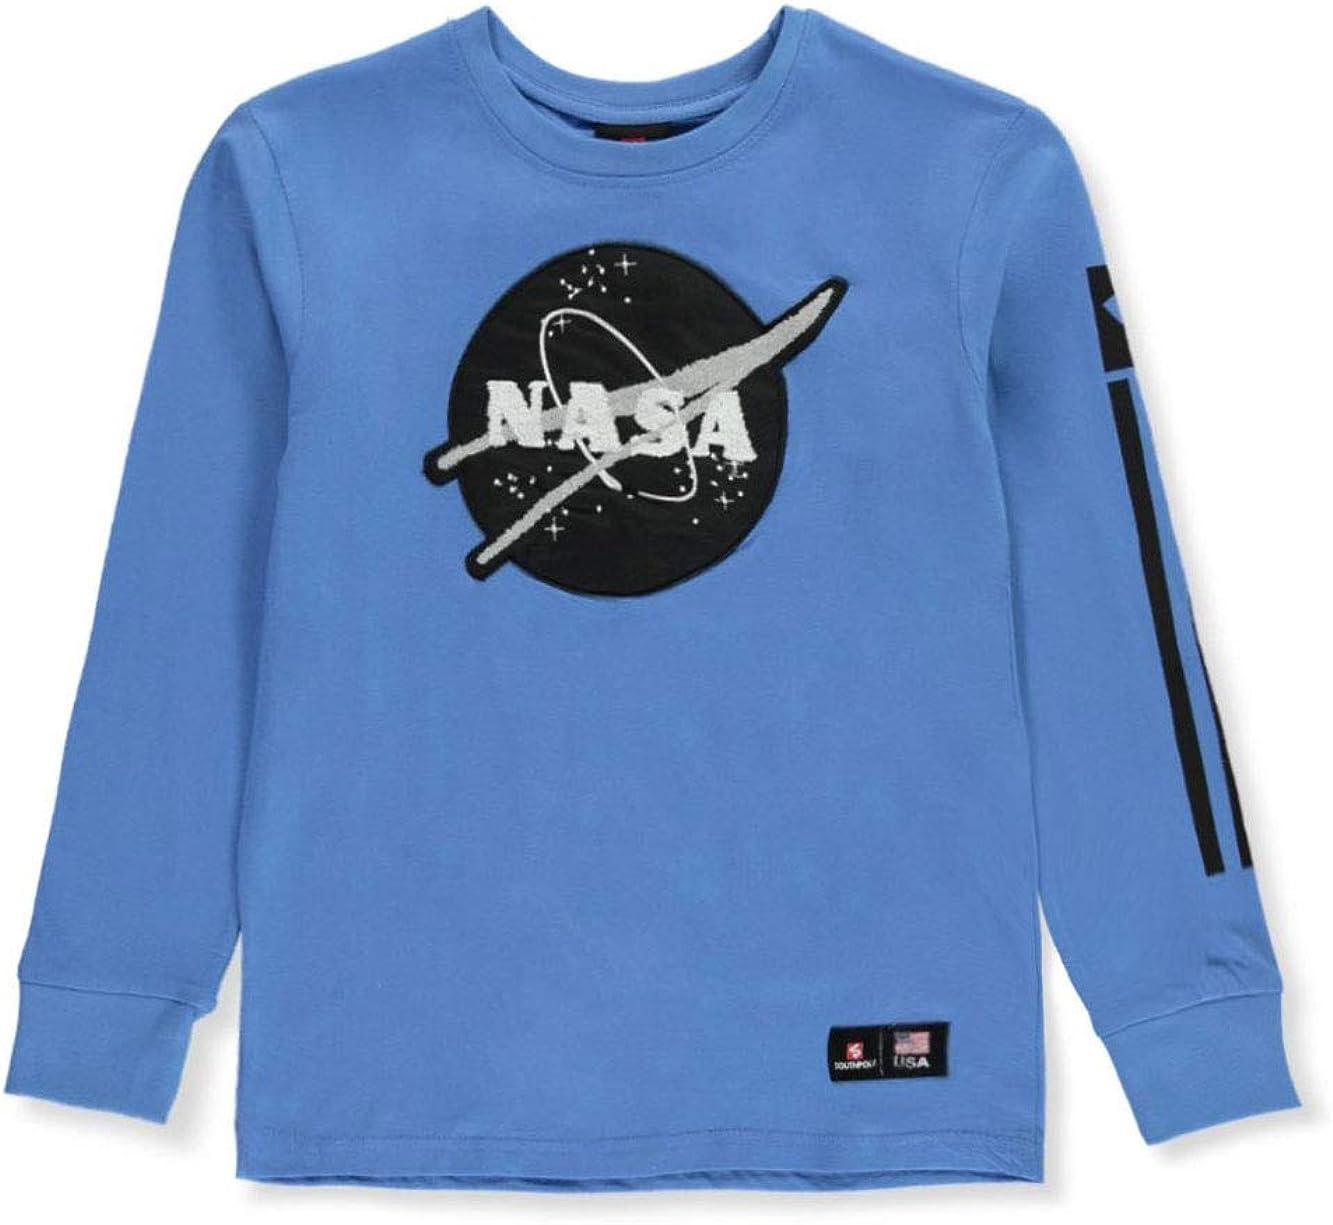 Southpole Boys' Big NASA Collection Fashion Tee Shirt (Short & Long Sleeve)